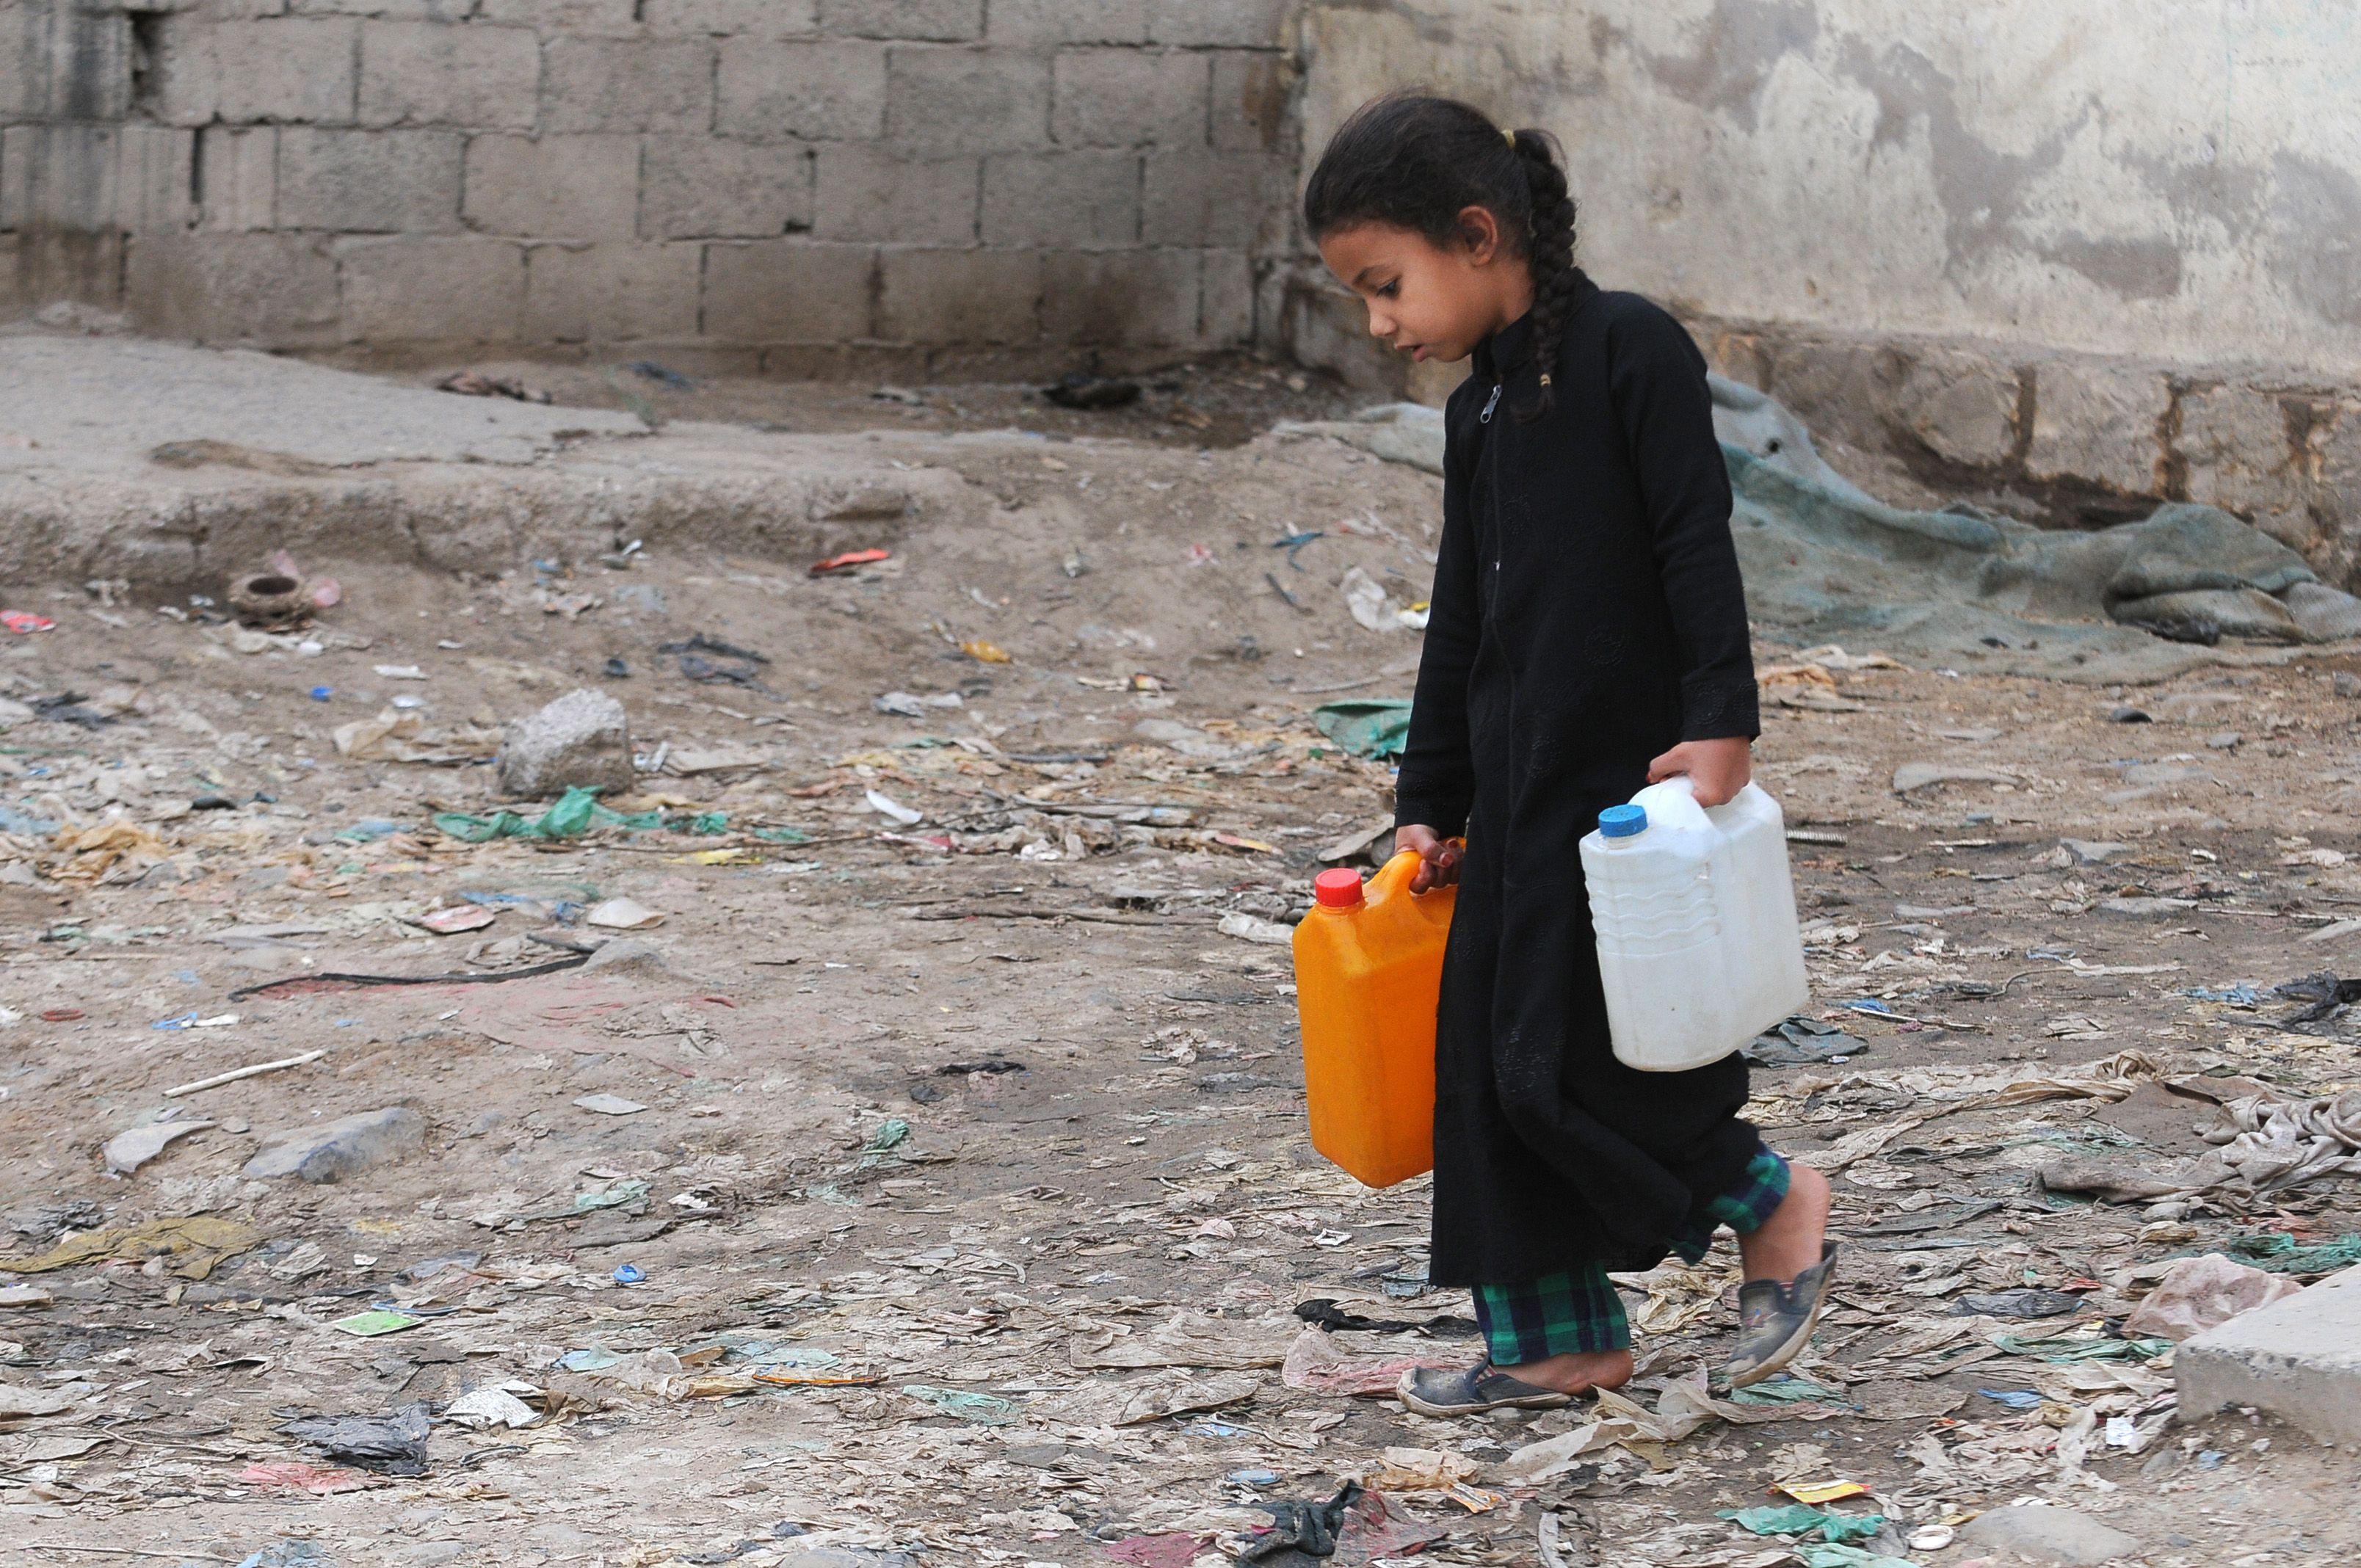 Yemenis Facing Continuing Clean Water Crisis